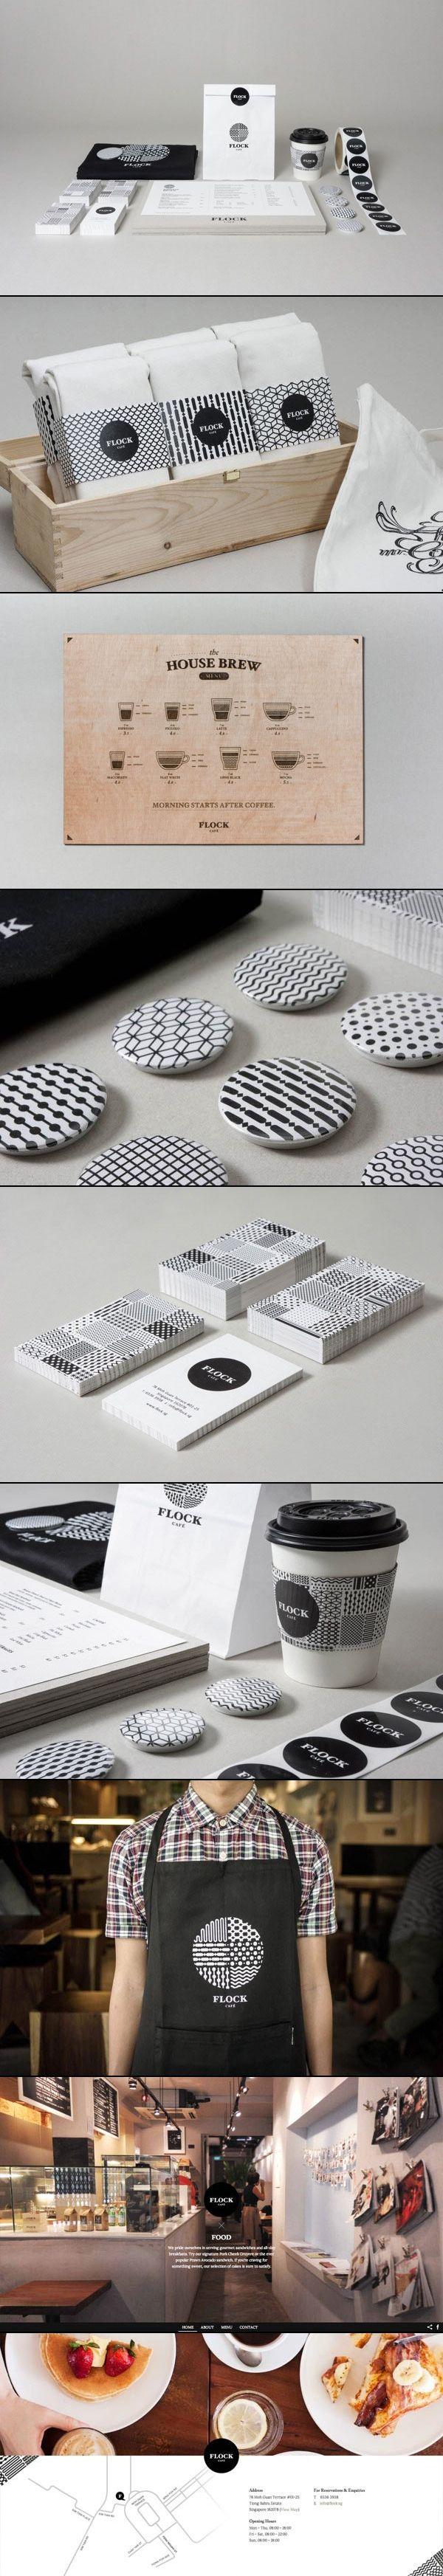 Art Direction and Branding by Kilo Studio for Flock Café #identity #packaging #branding PD